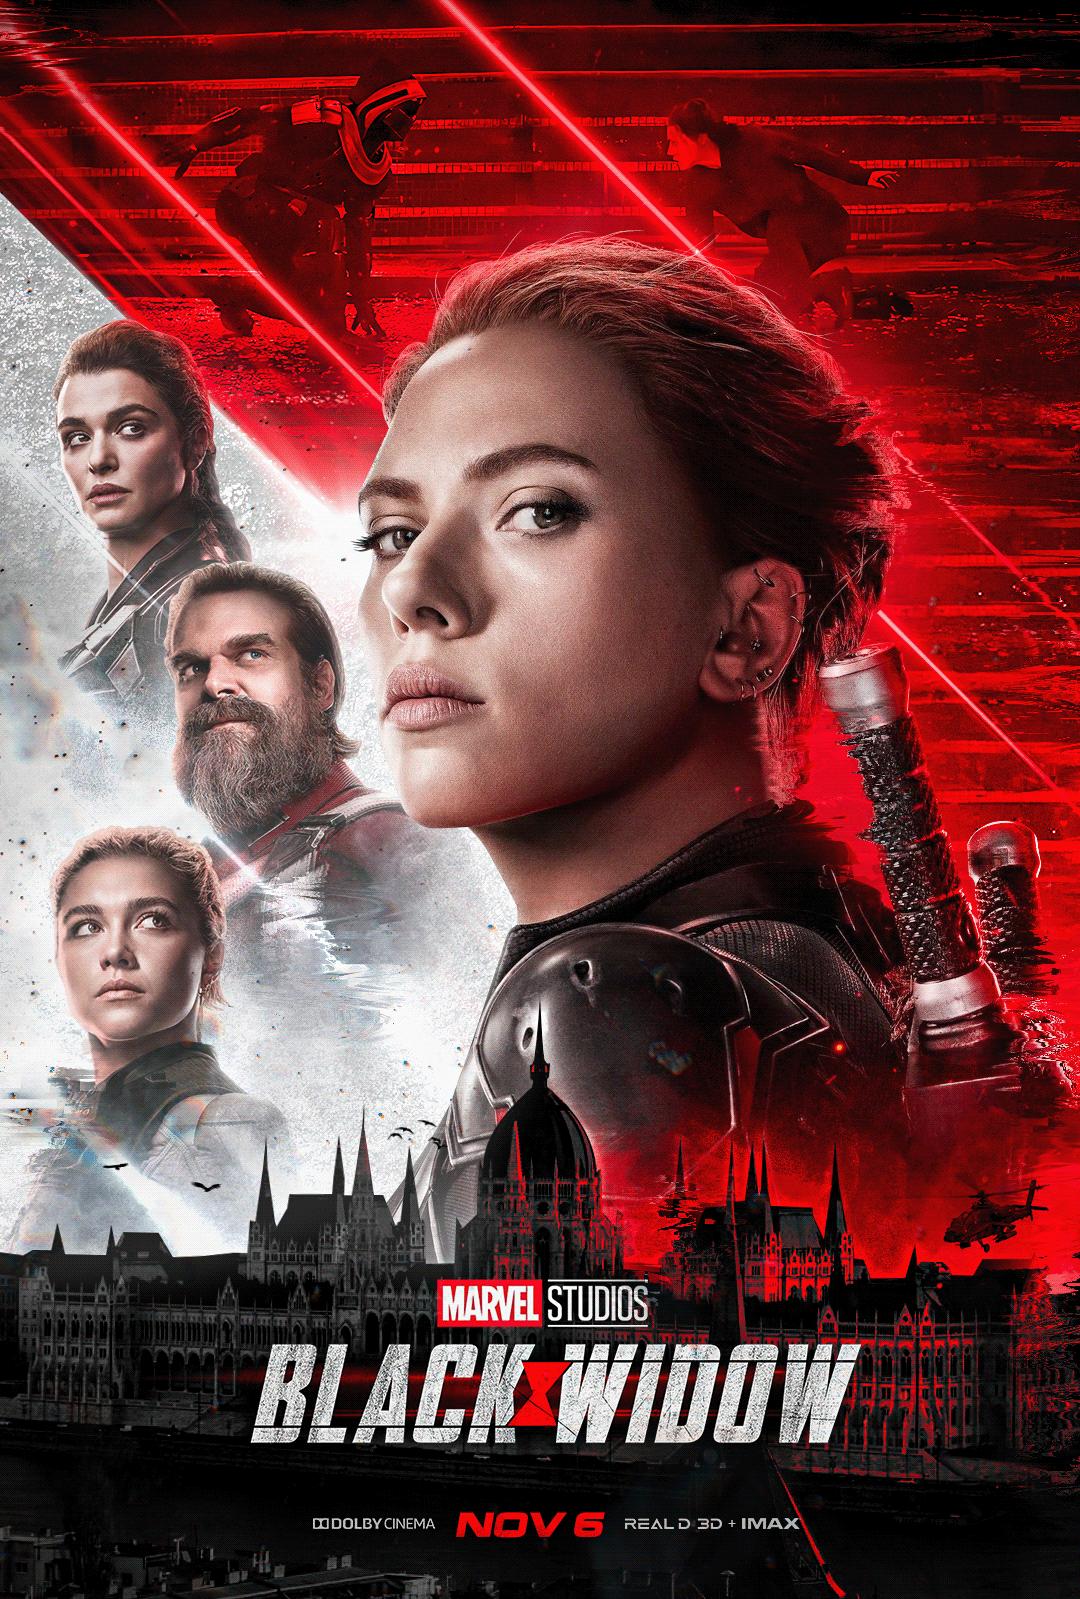 Blackwidow Movie Poster On Behance Black Widow Marvel Black Widow Movie Black Widow